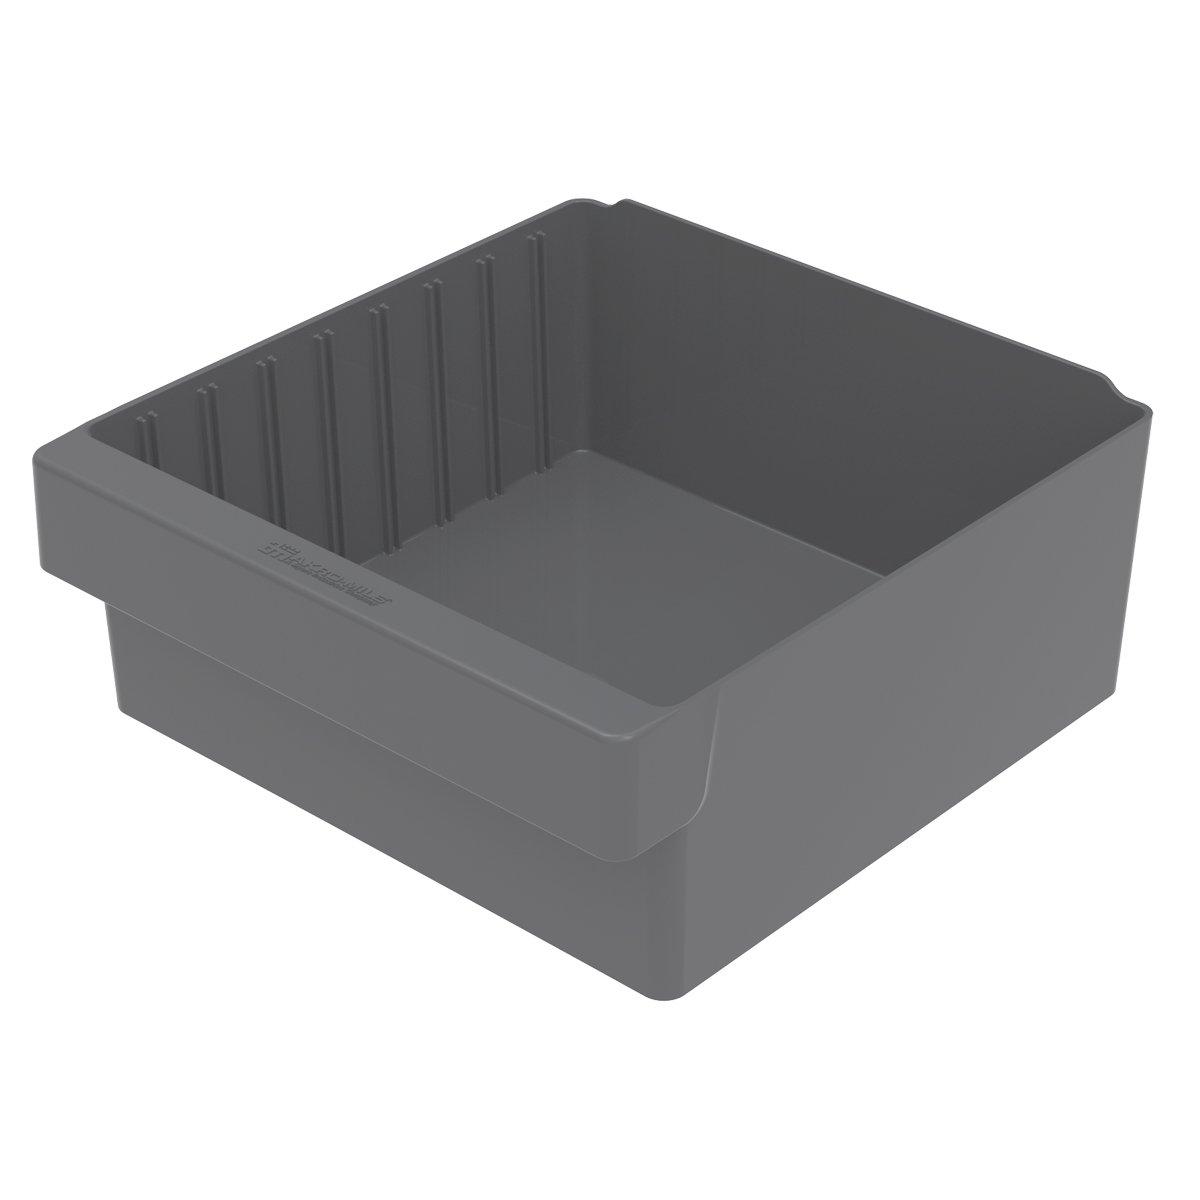 Akro-Mils 31112 11-5/8-Inch L by 11-1/8-Inch W by 4-5/8-Inch H AkroDrawer Plastic Storage Drawer, Grey, Case of 4